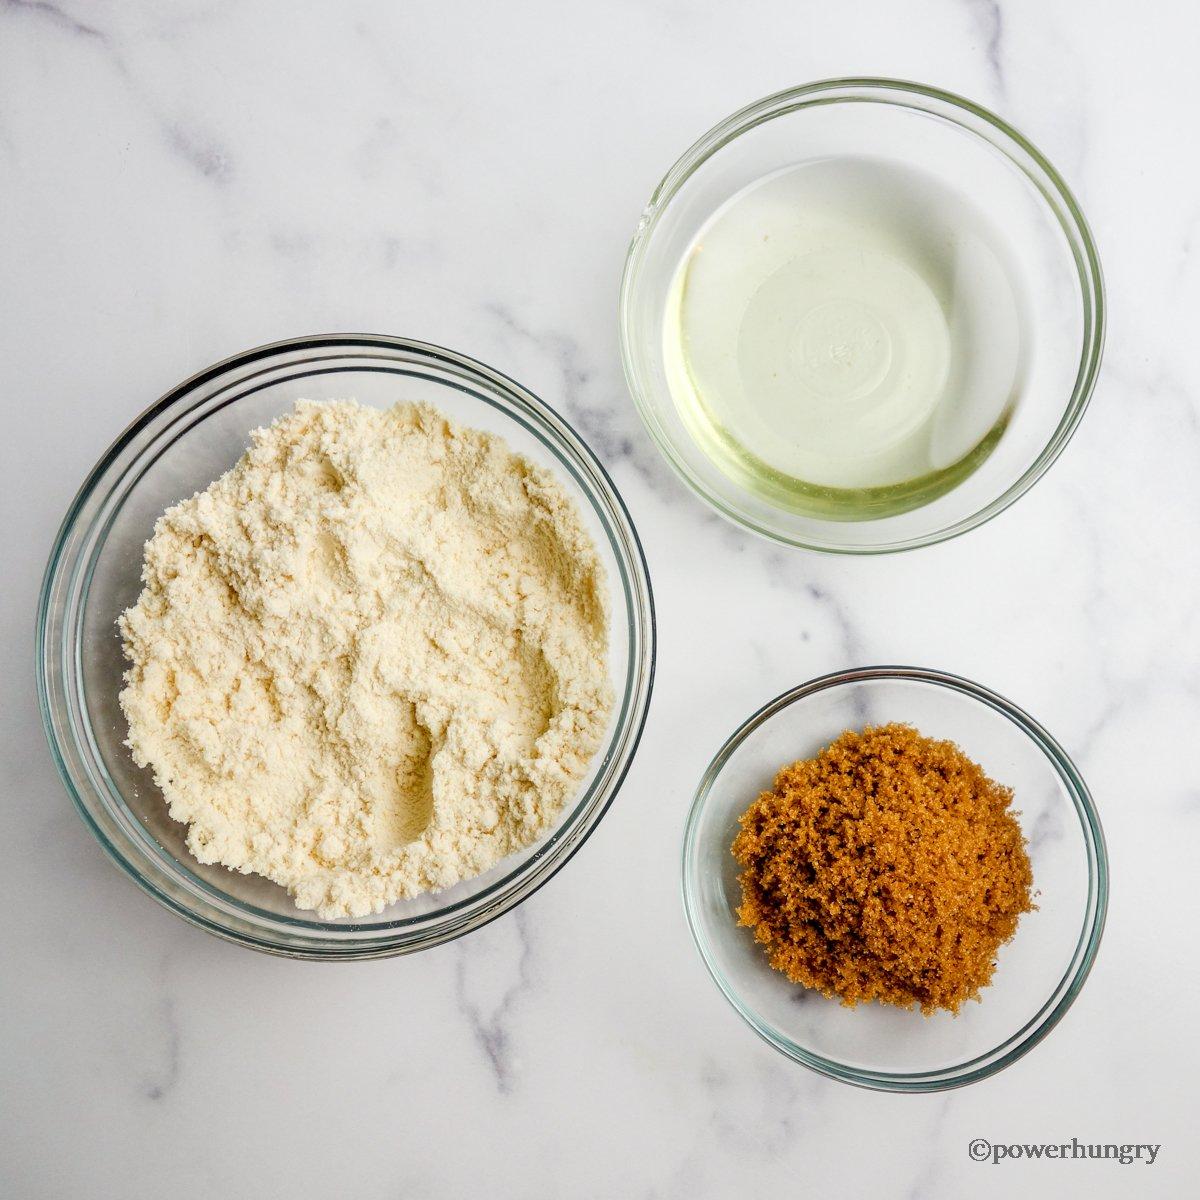 ingredients for coconut flour shortbread cookies